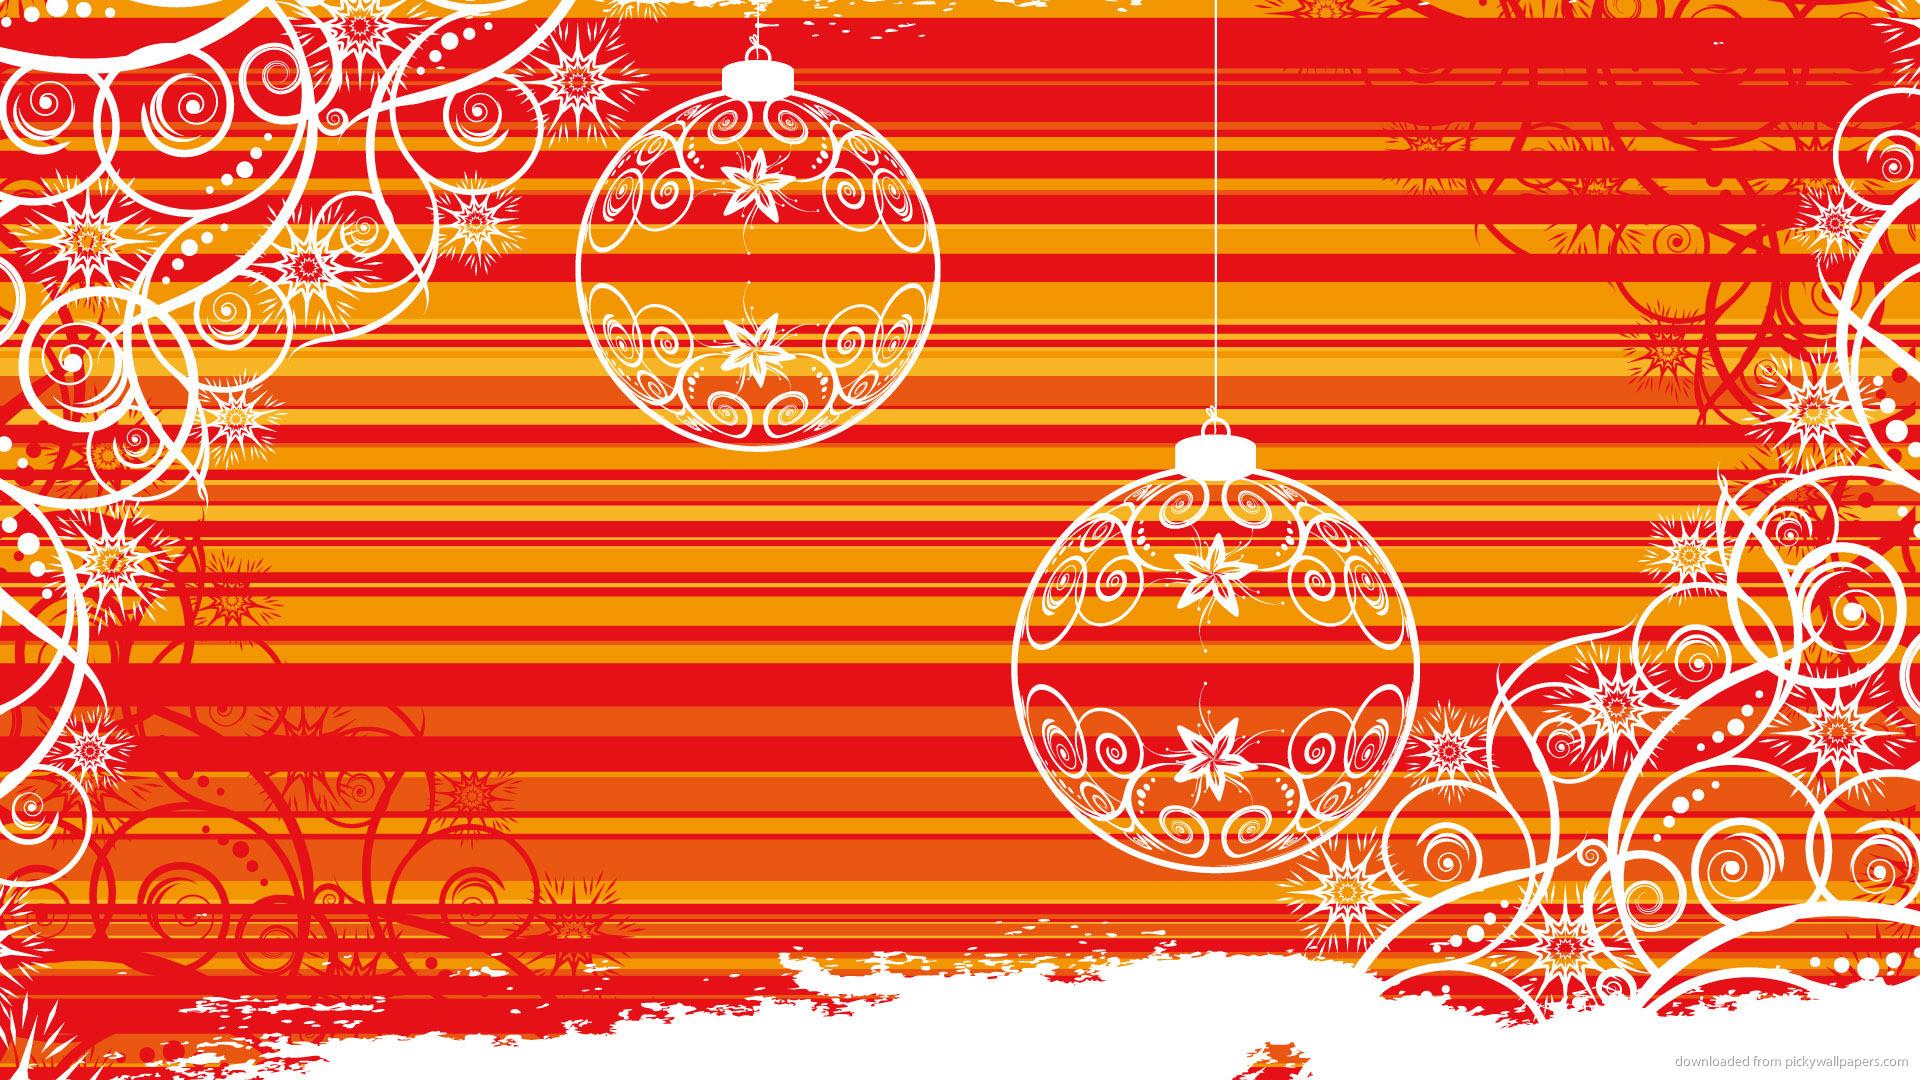 HD Orange stripes and white balls wallpaper